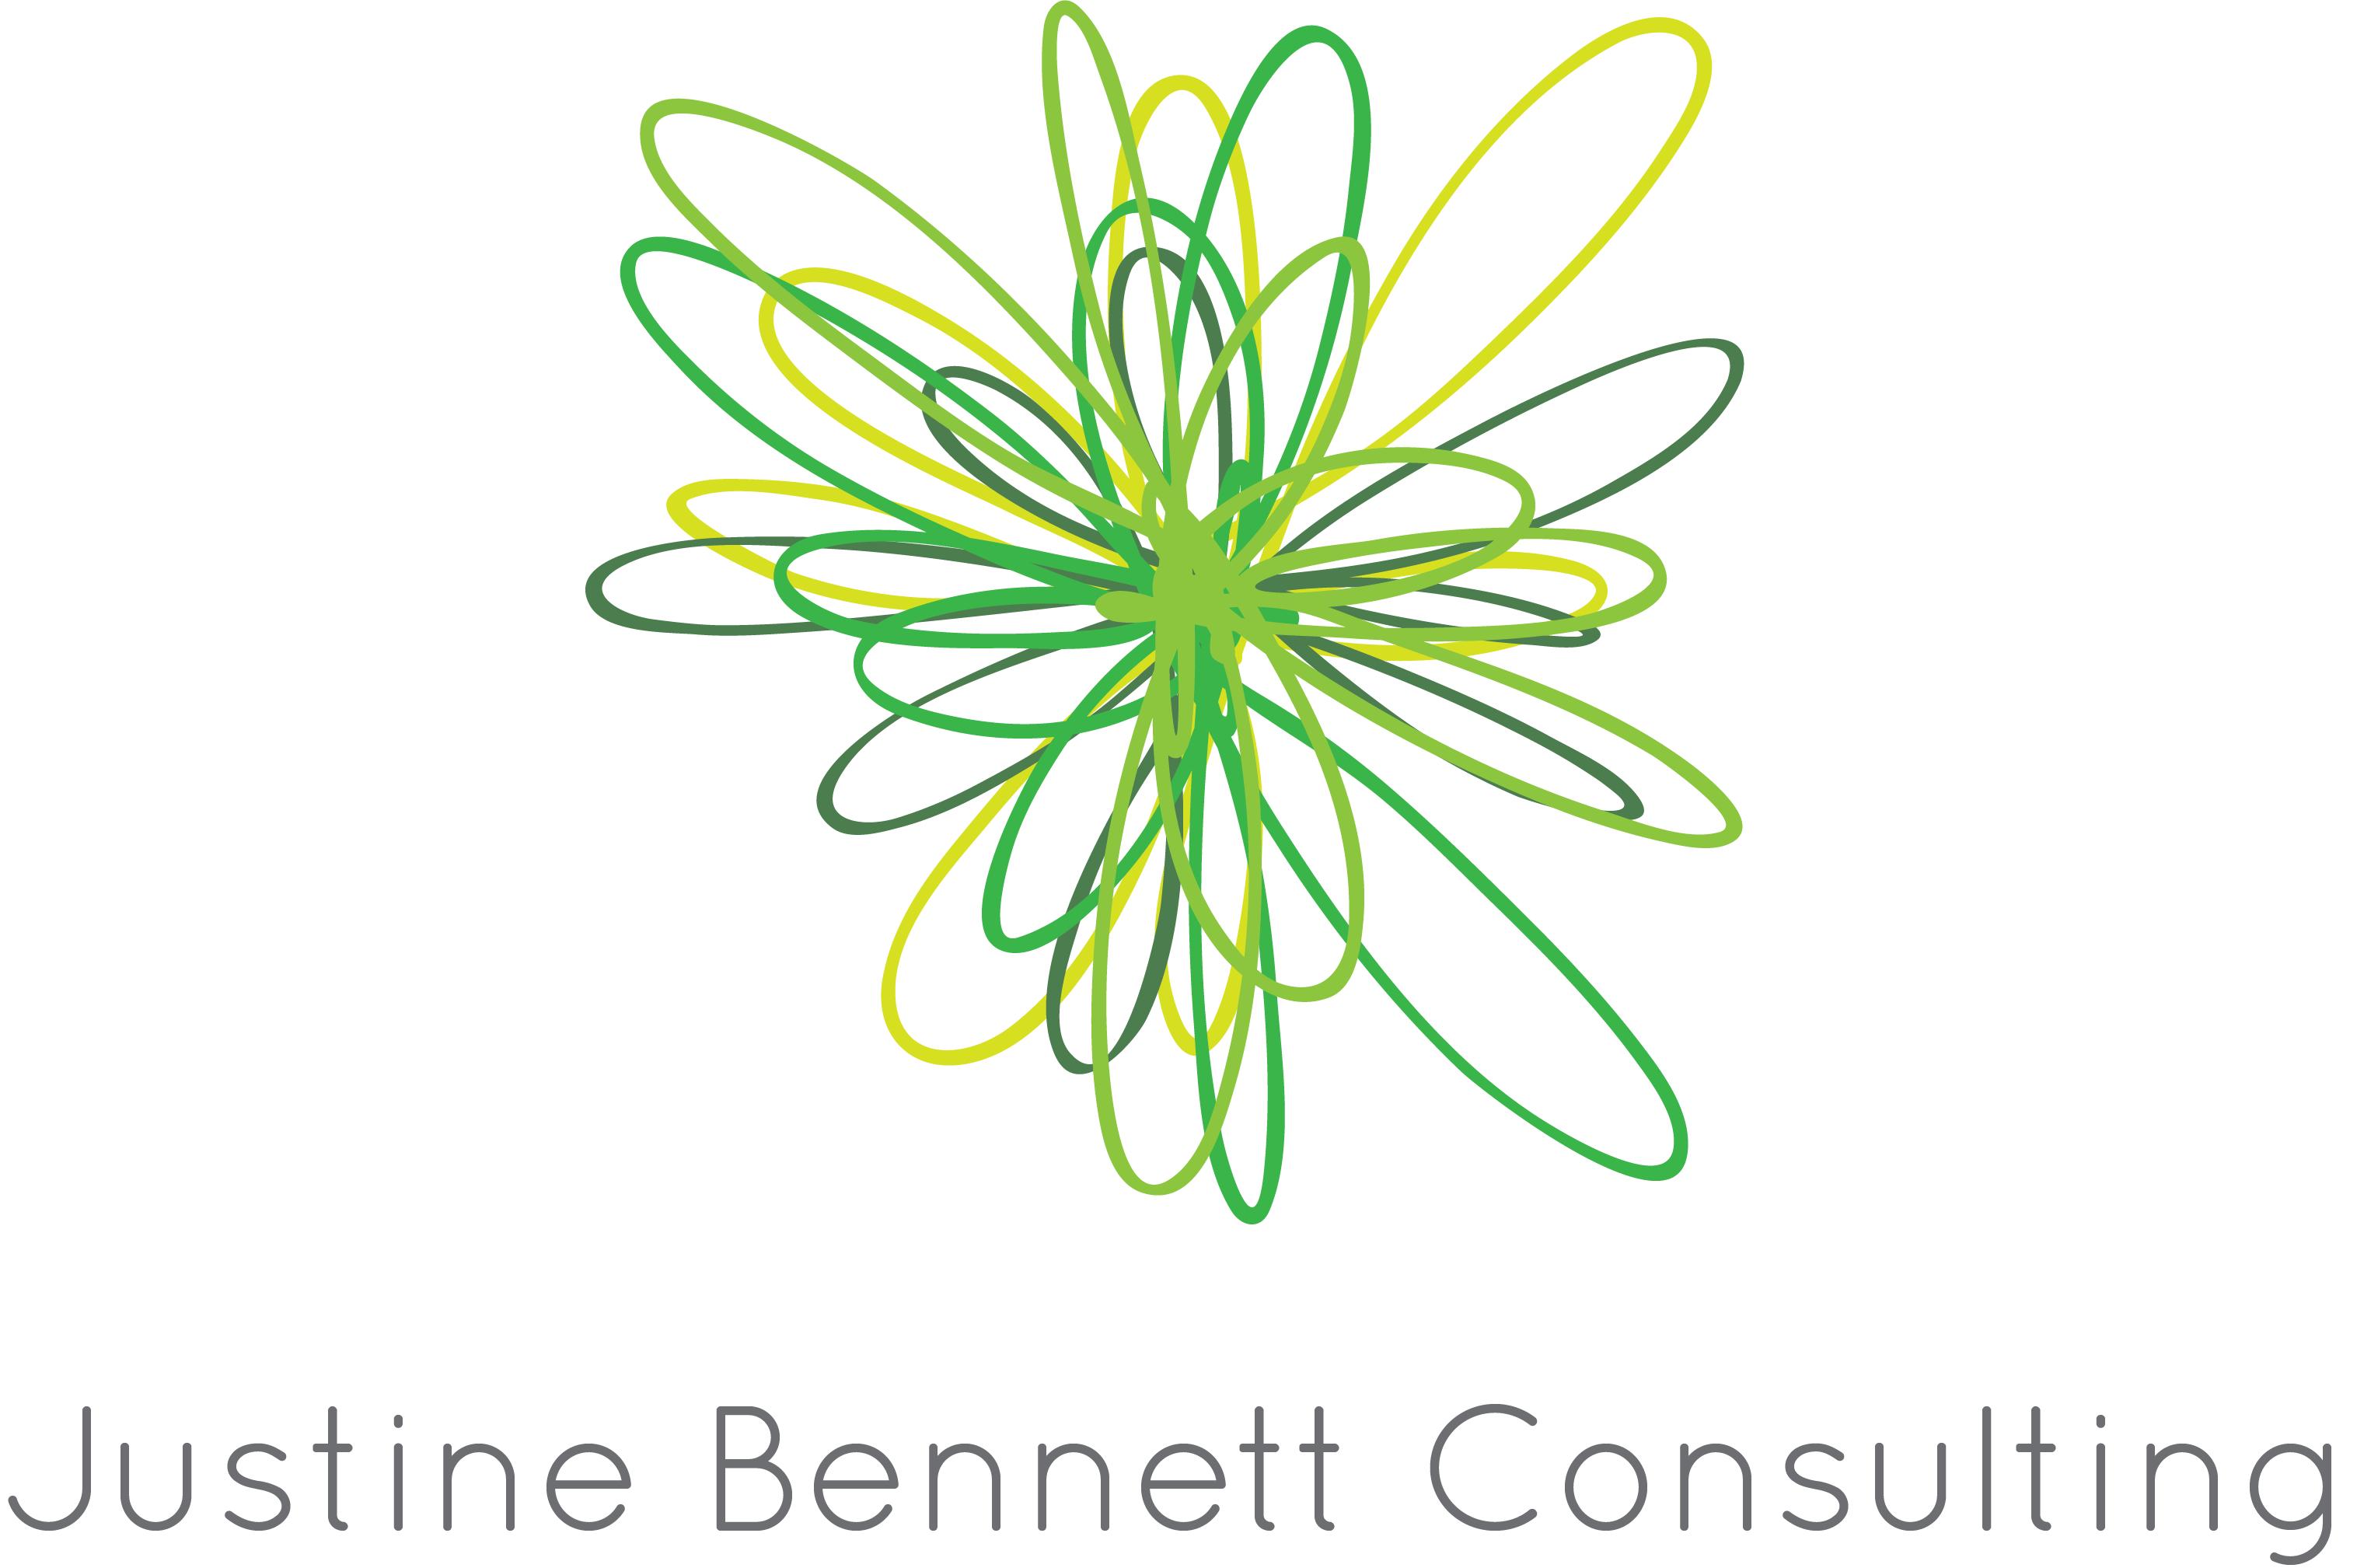 Justine Bennett Consulting logo